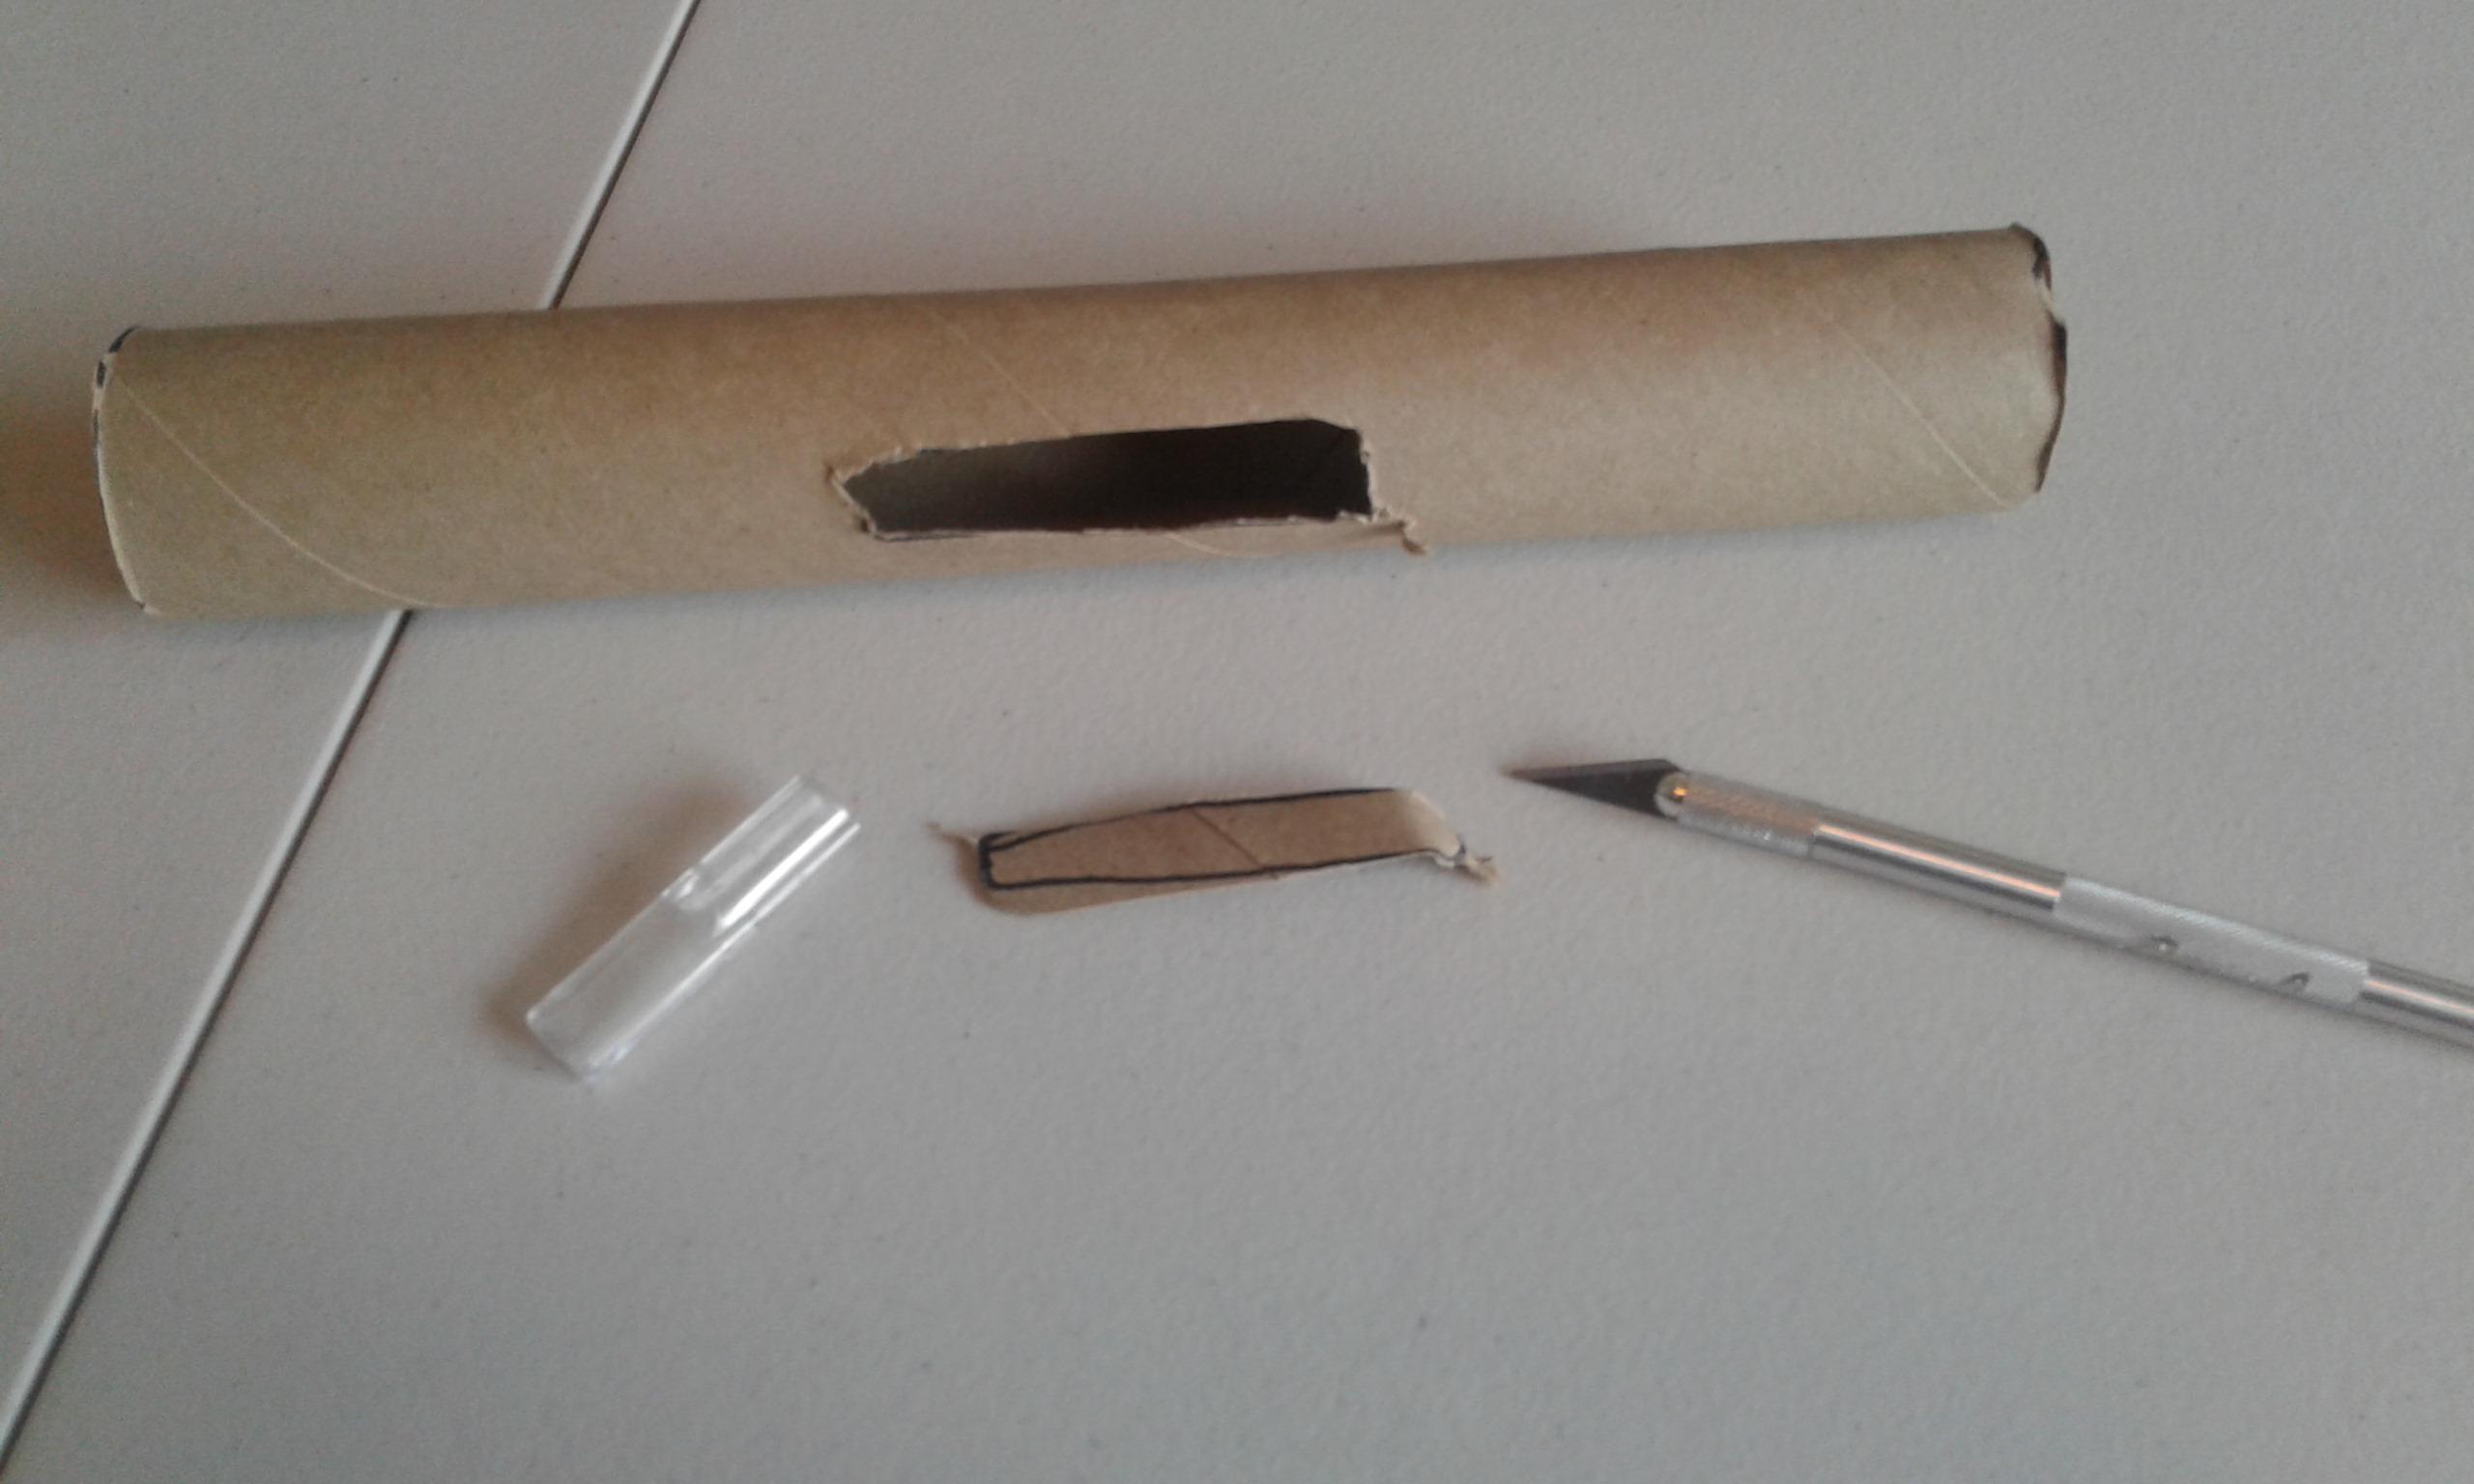 Picture of Cutting (ADUT SUPER VISION)